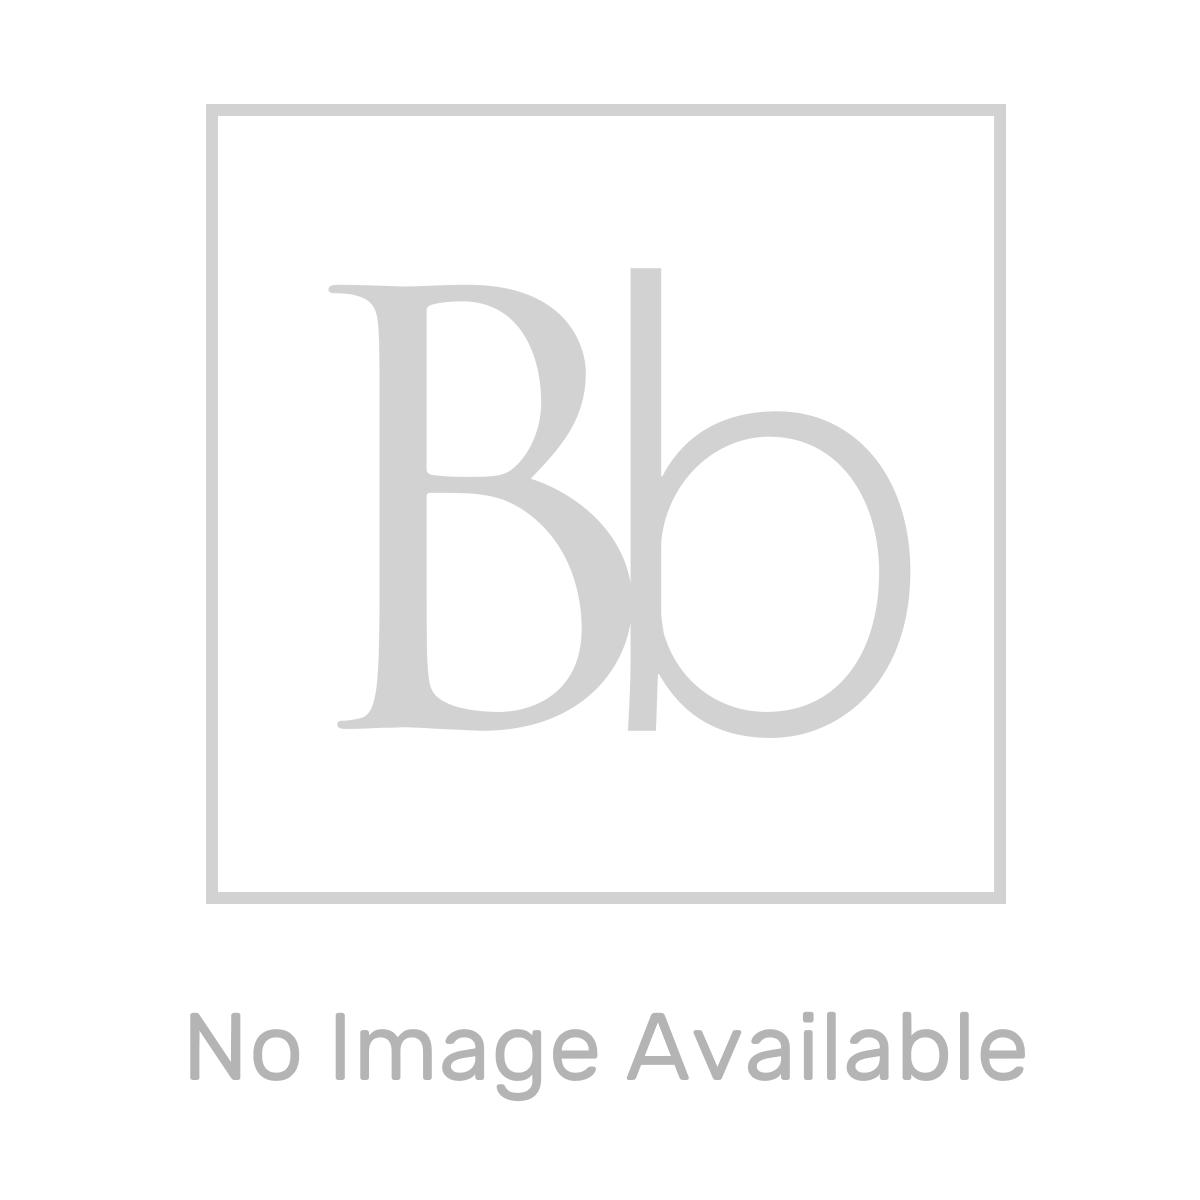 Aquadart Rectangular 1100 x 900 Shower Tray